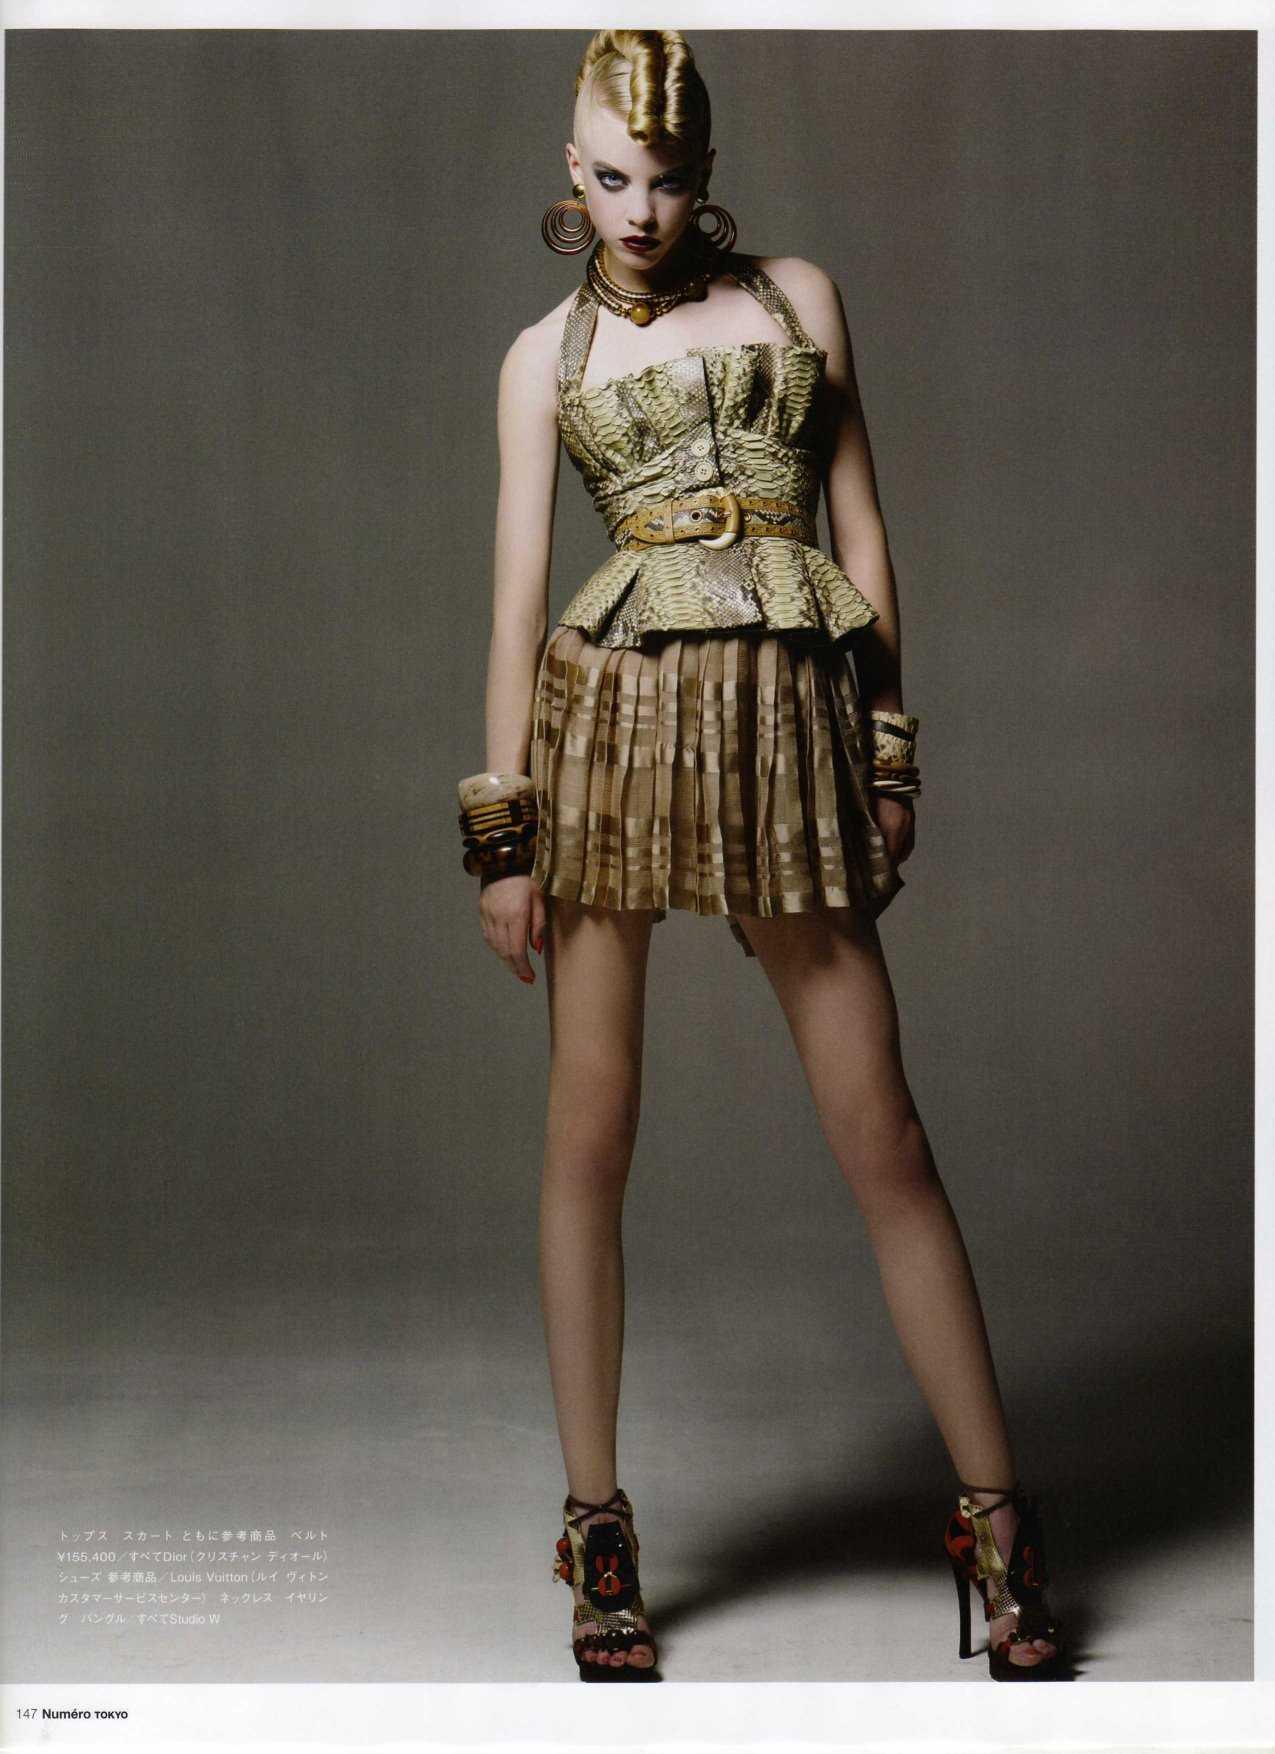 Skye Stracke dress